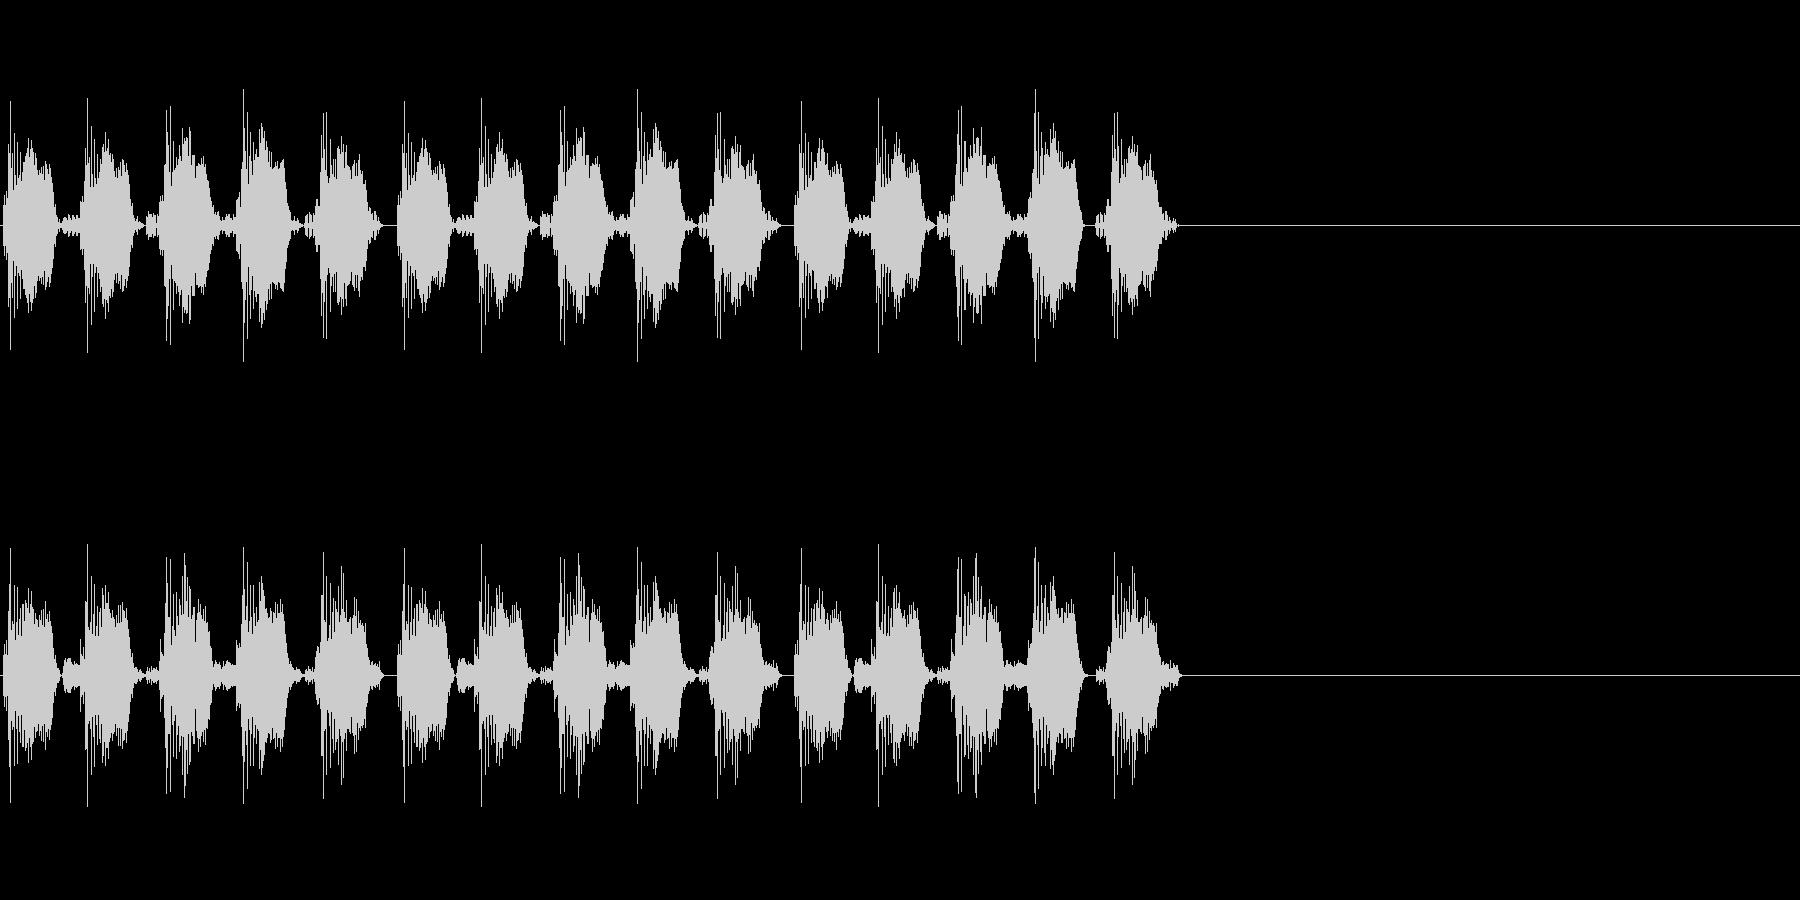 KANT自主規制音1shortの未再生の波形